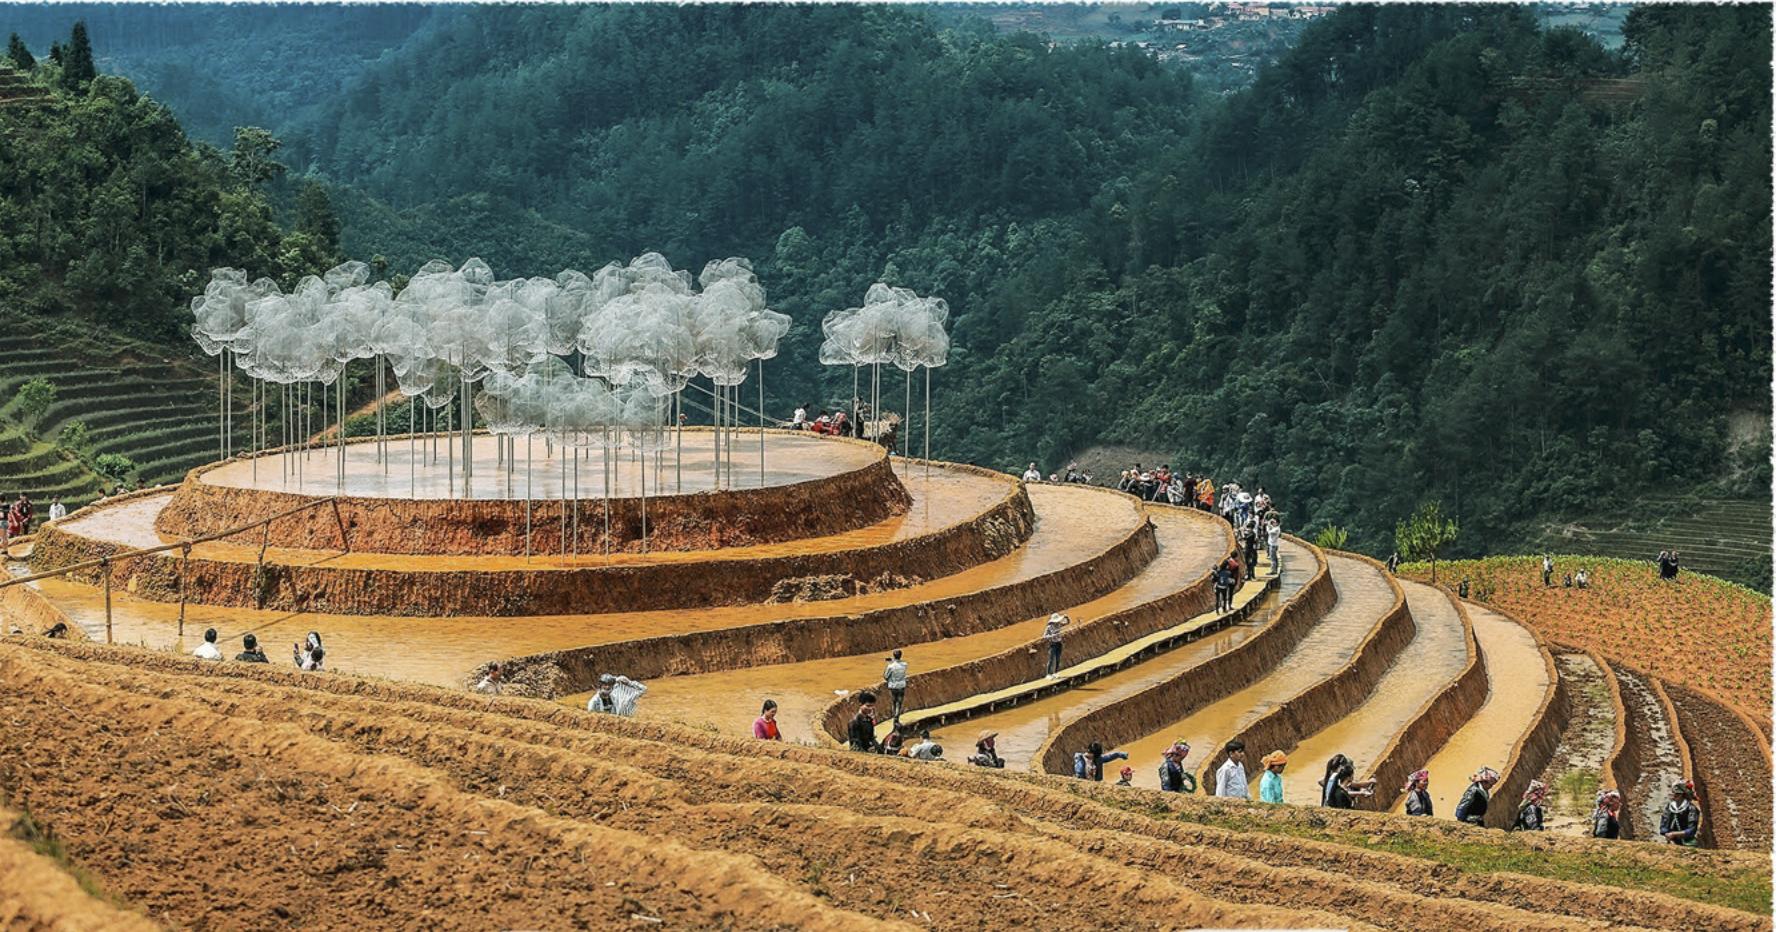 Mam Xoi Hill in Mu Cang Chai District, Yen Bai Province, Vietnam. Photo: Nam Tran / Tuoi Tre